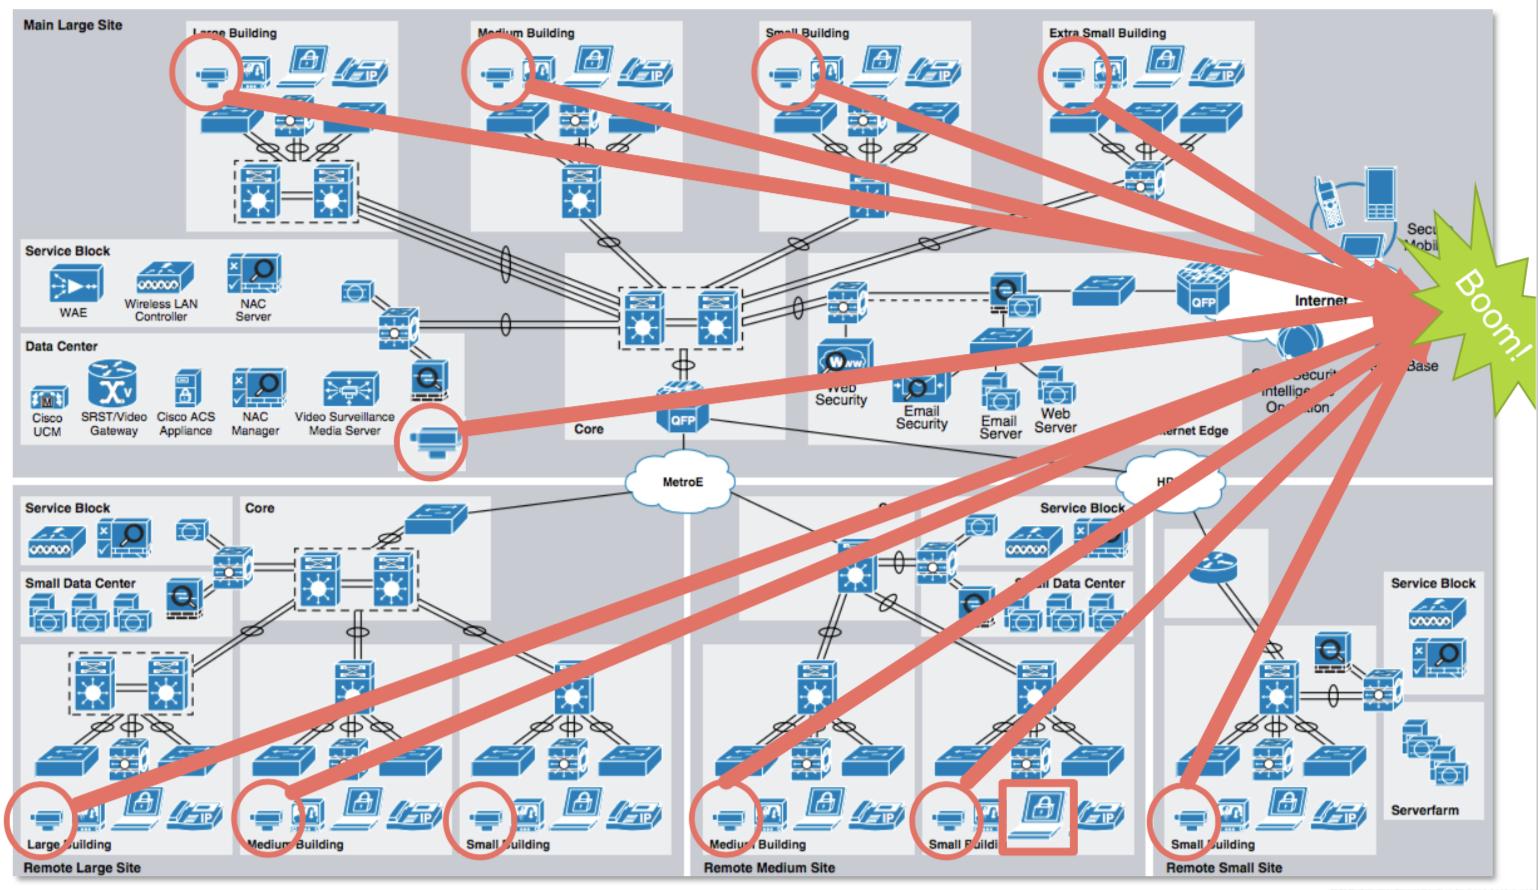 sFlow: Intranet DDoS attacks